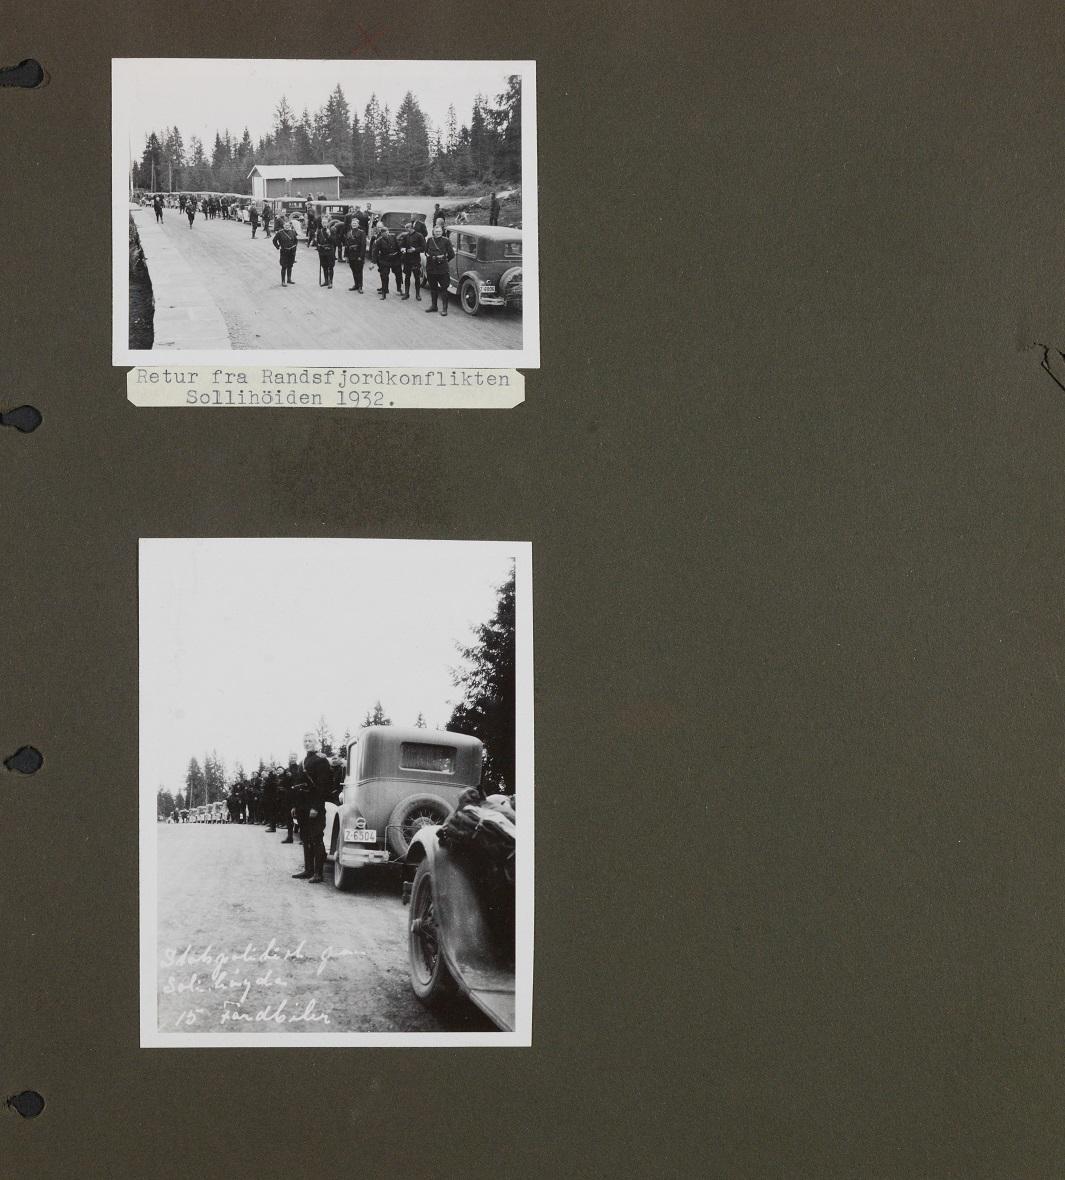 Bildet er en kopi hentet fra album A i Utrykningspolitiets fotosamling